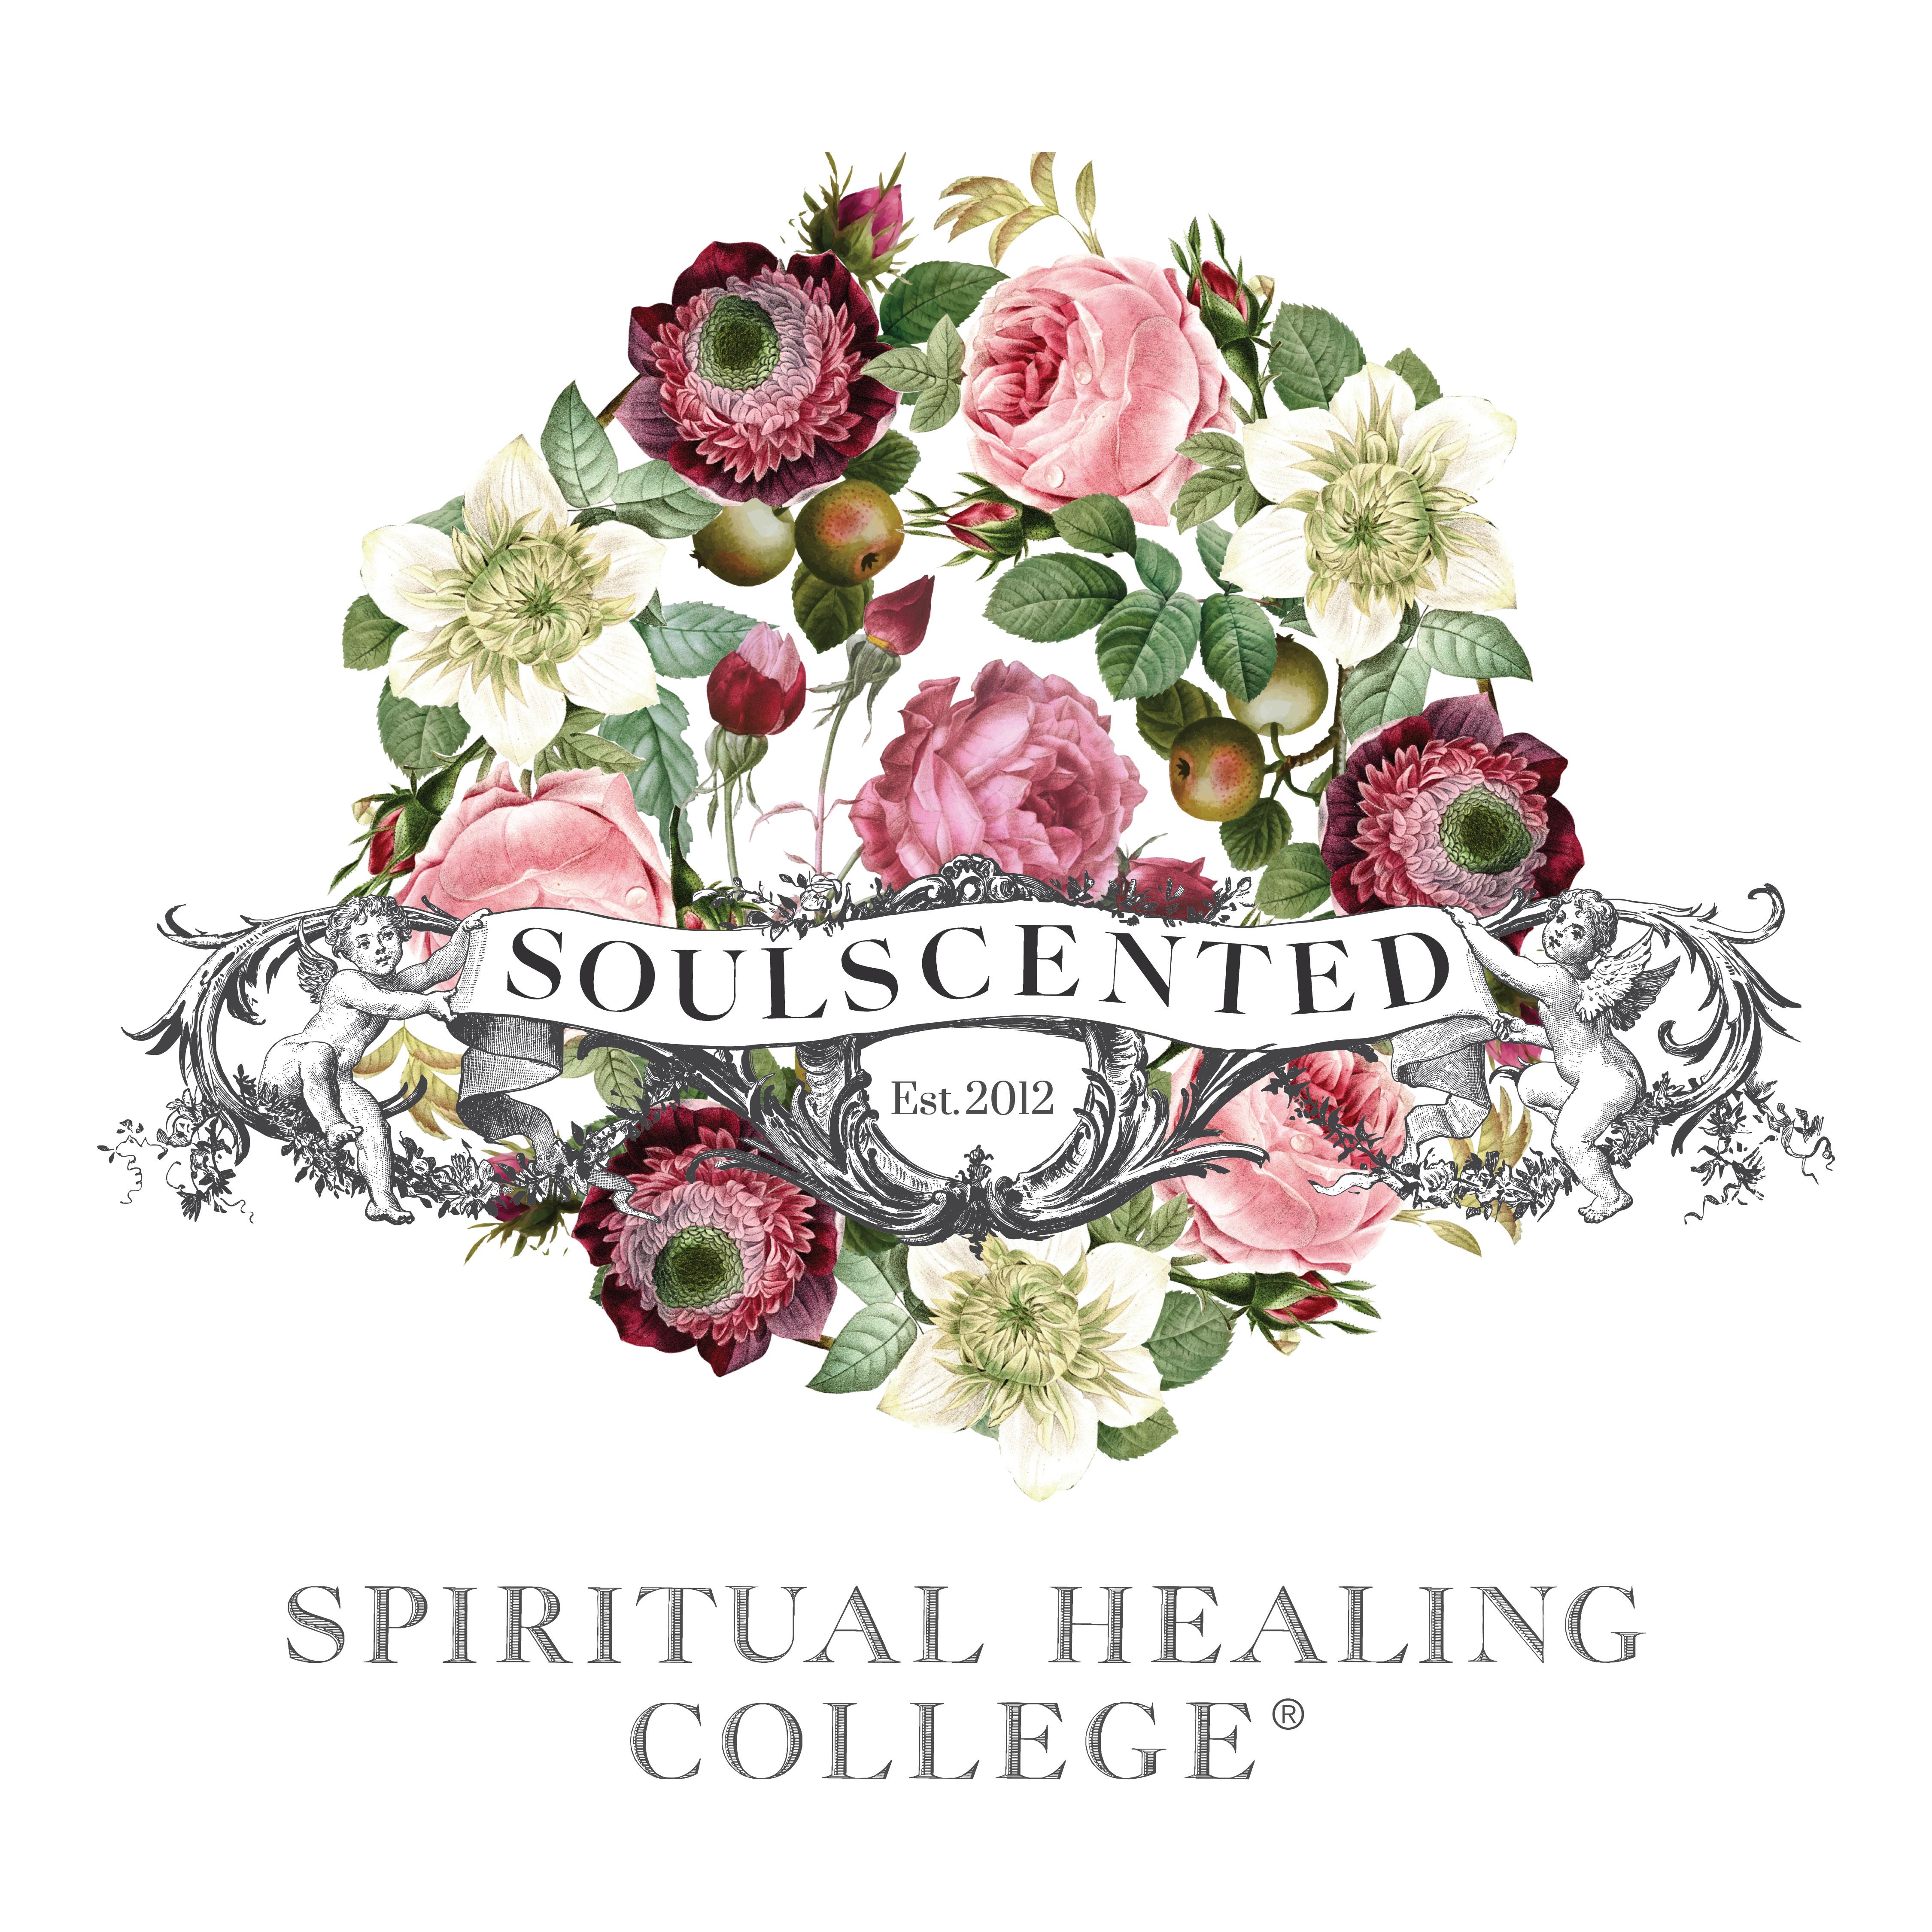 Spiritual Healing College